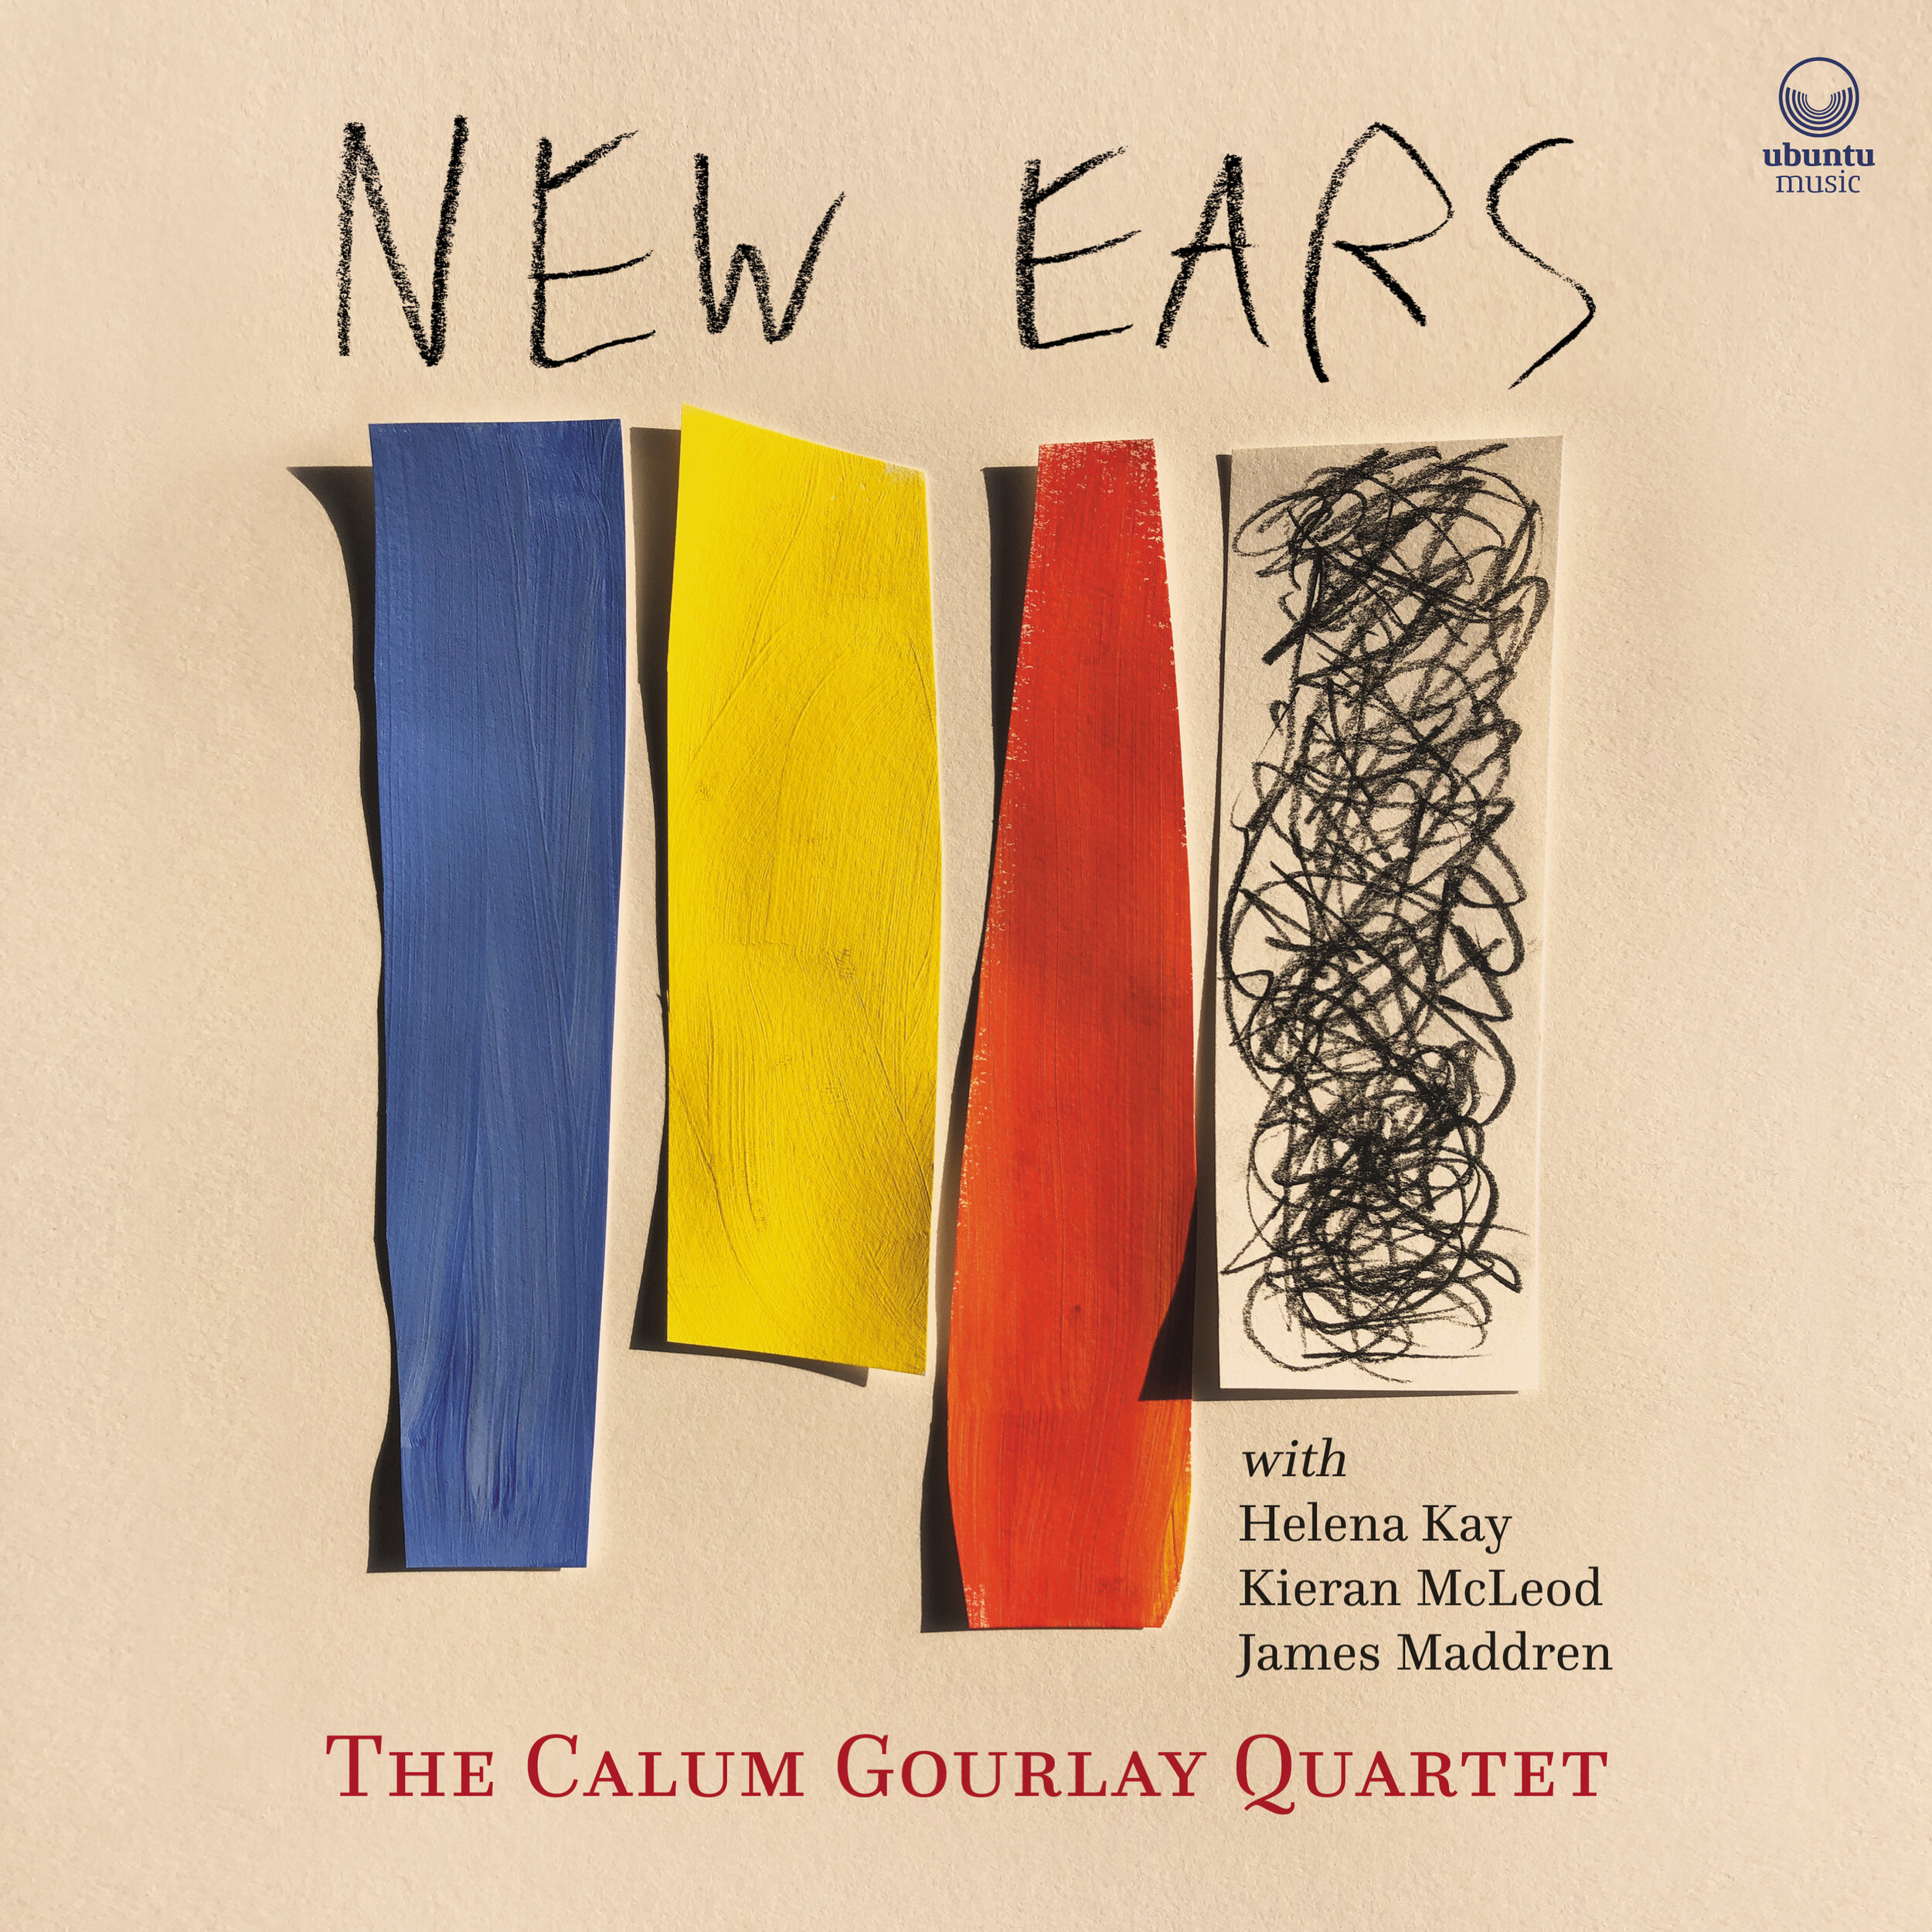 Calum Gourlay Quartet /  New Ears  / UBU0043